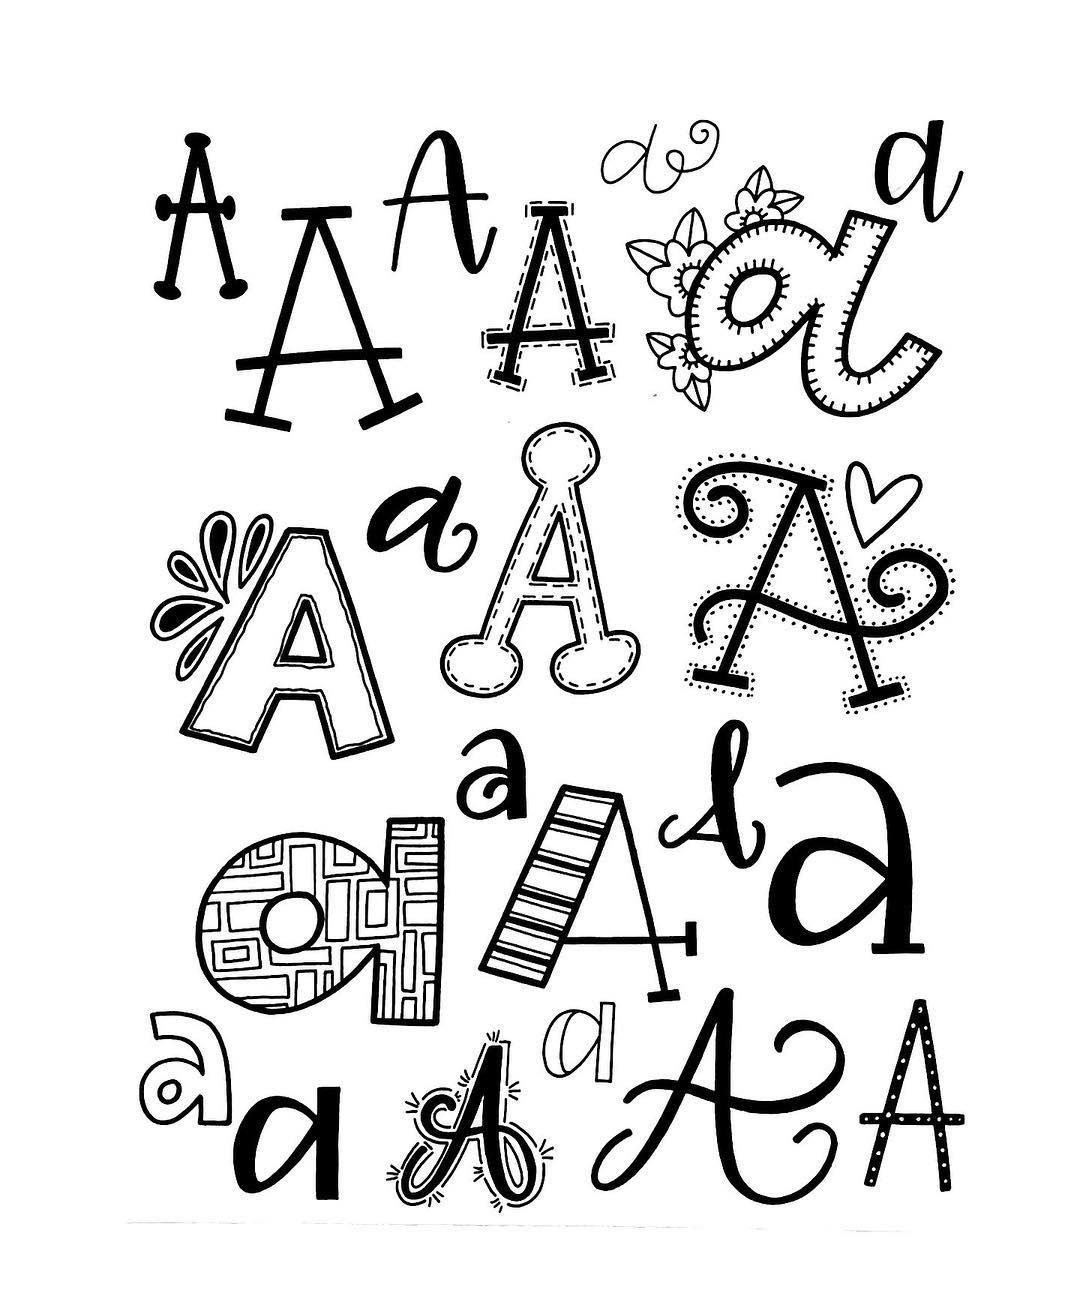 Letter A for the #handletteredabcs_2017 challenge! #handletteredabcs #abcs_a #lettering #handlettering #handletteringpractice #typography #typespire #typegang #typeyeah #strengthinletters #font #handfont #handmadefont #alphabet #alphabetart #a #lettera #tombow #tombowusa #zigwriter #letteringchallenge #calligrafriends #alphabet #handletter